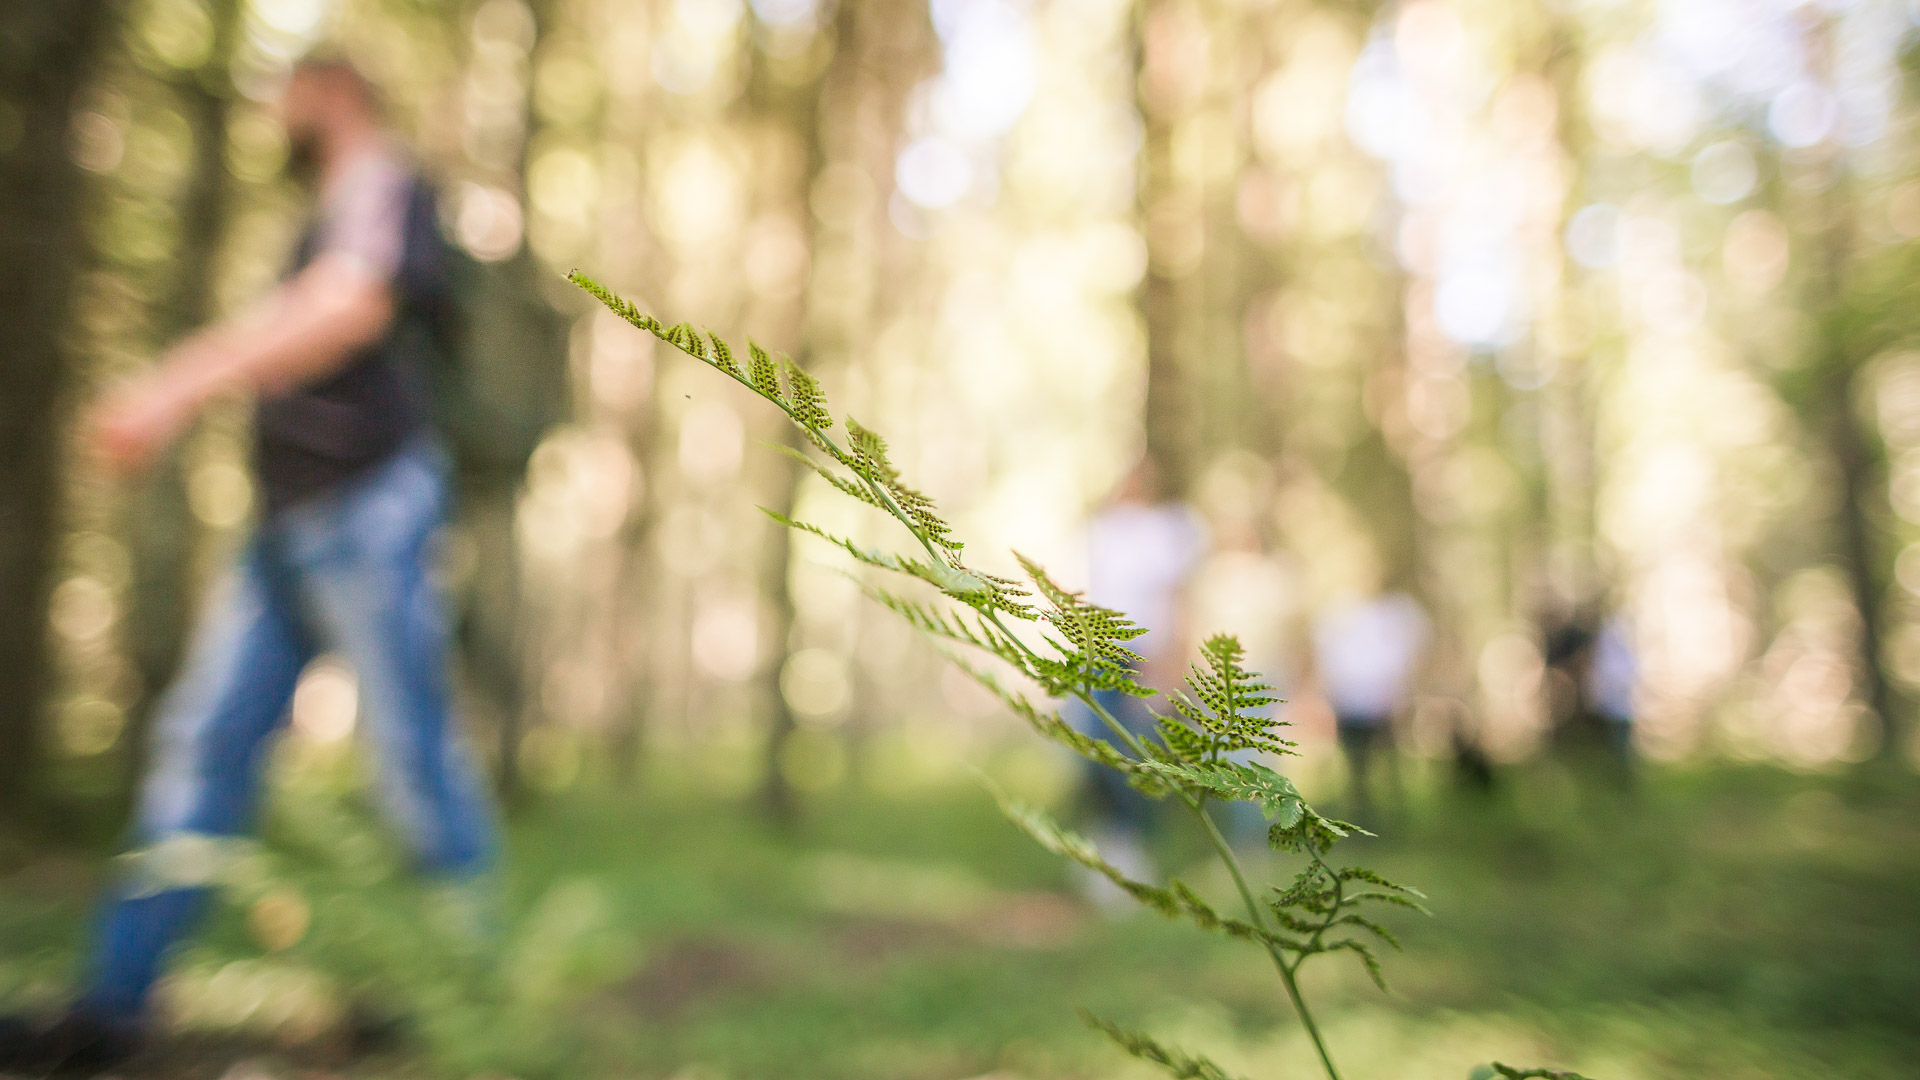 Visit Tampere Korsuretket Patikointi Hiking Forest Nature Laura Vanzo 9